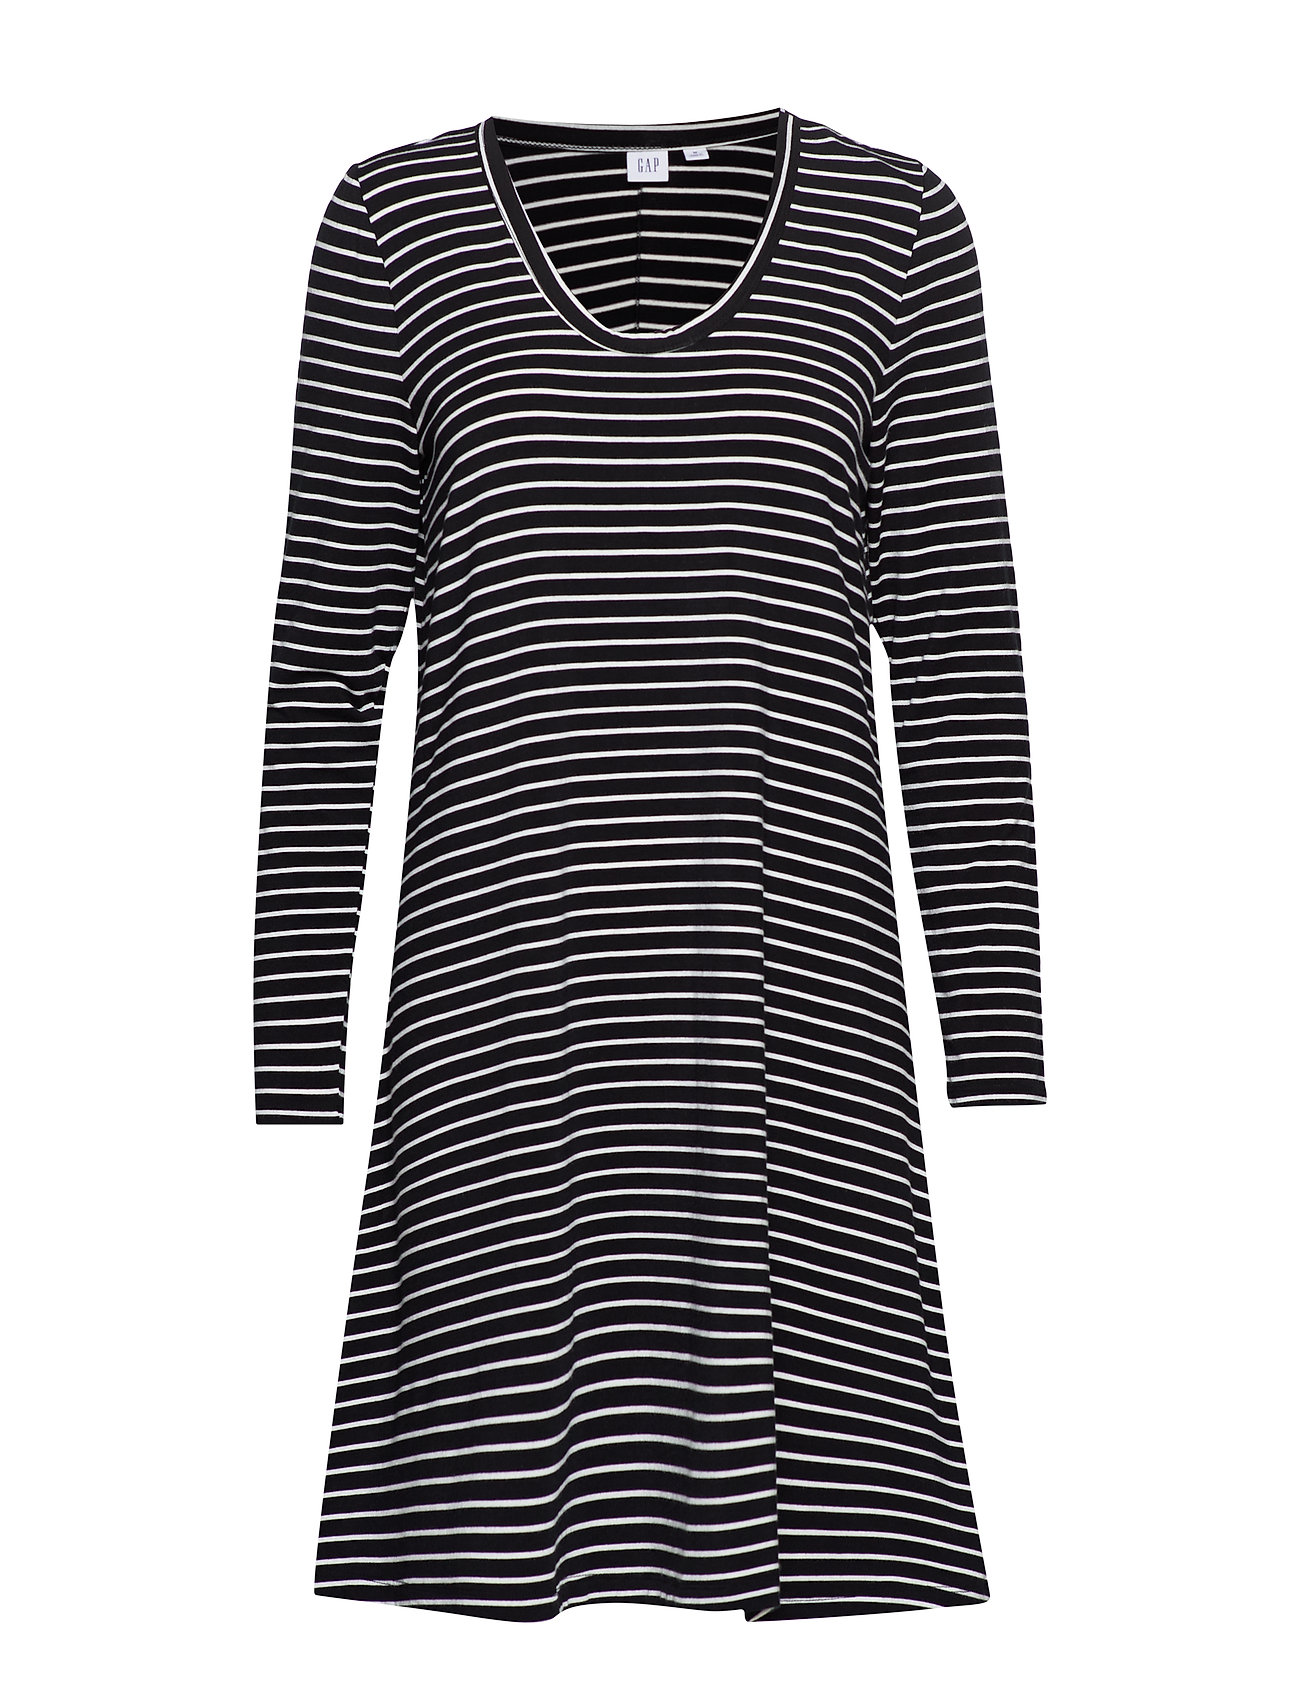 GAP U-Neck Swing Dress - BLACK/WHITE STRP - J